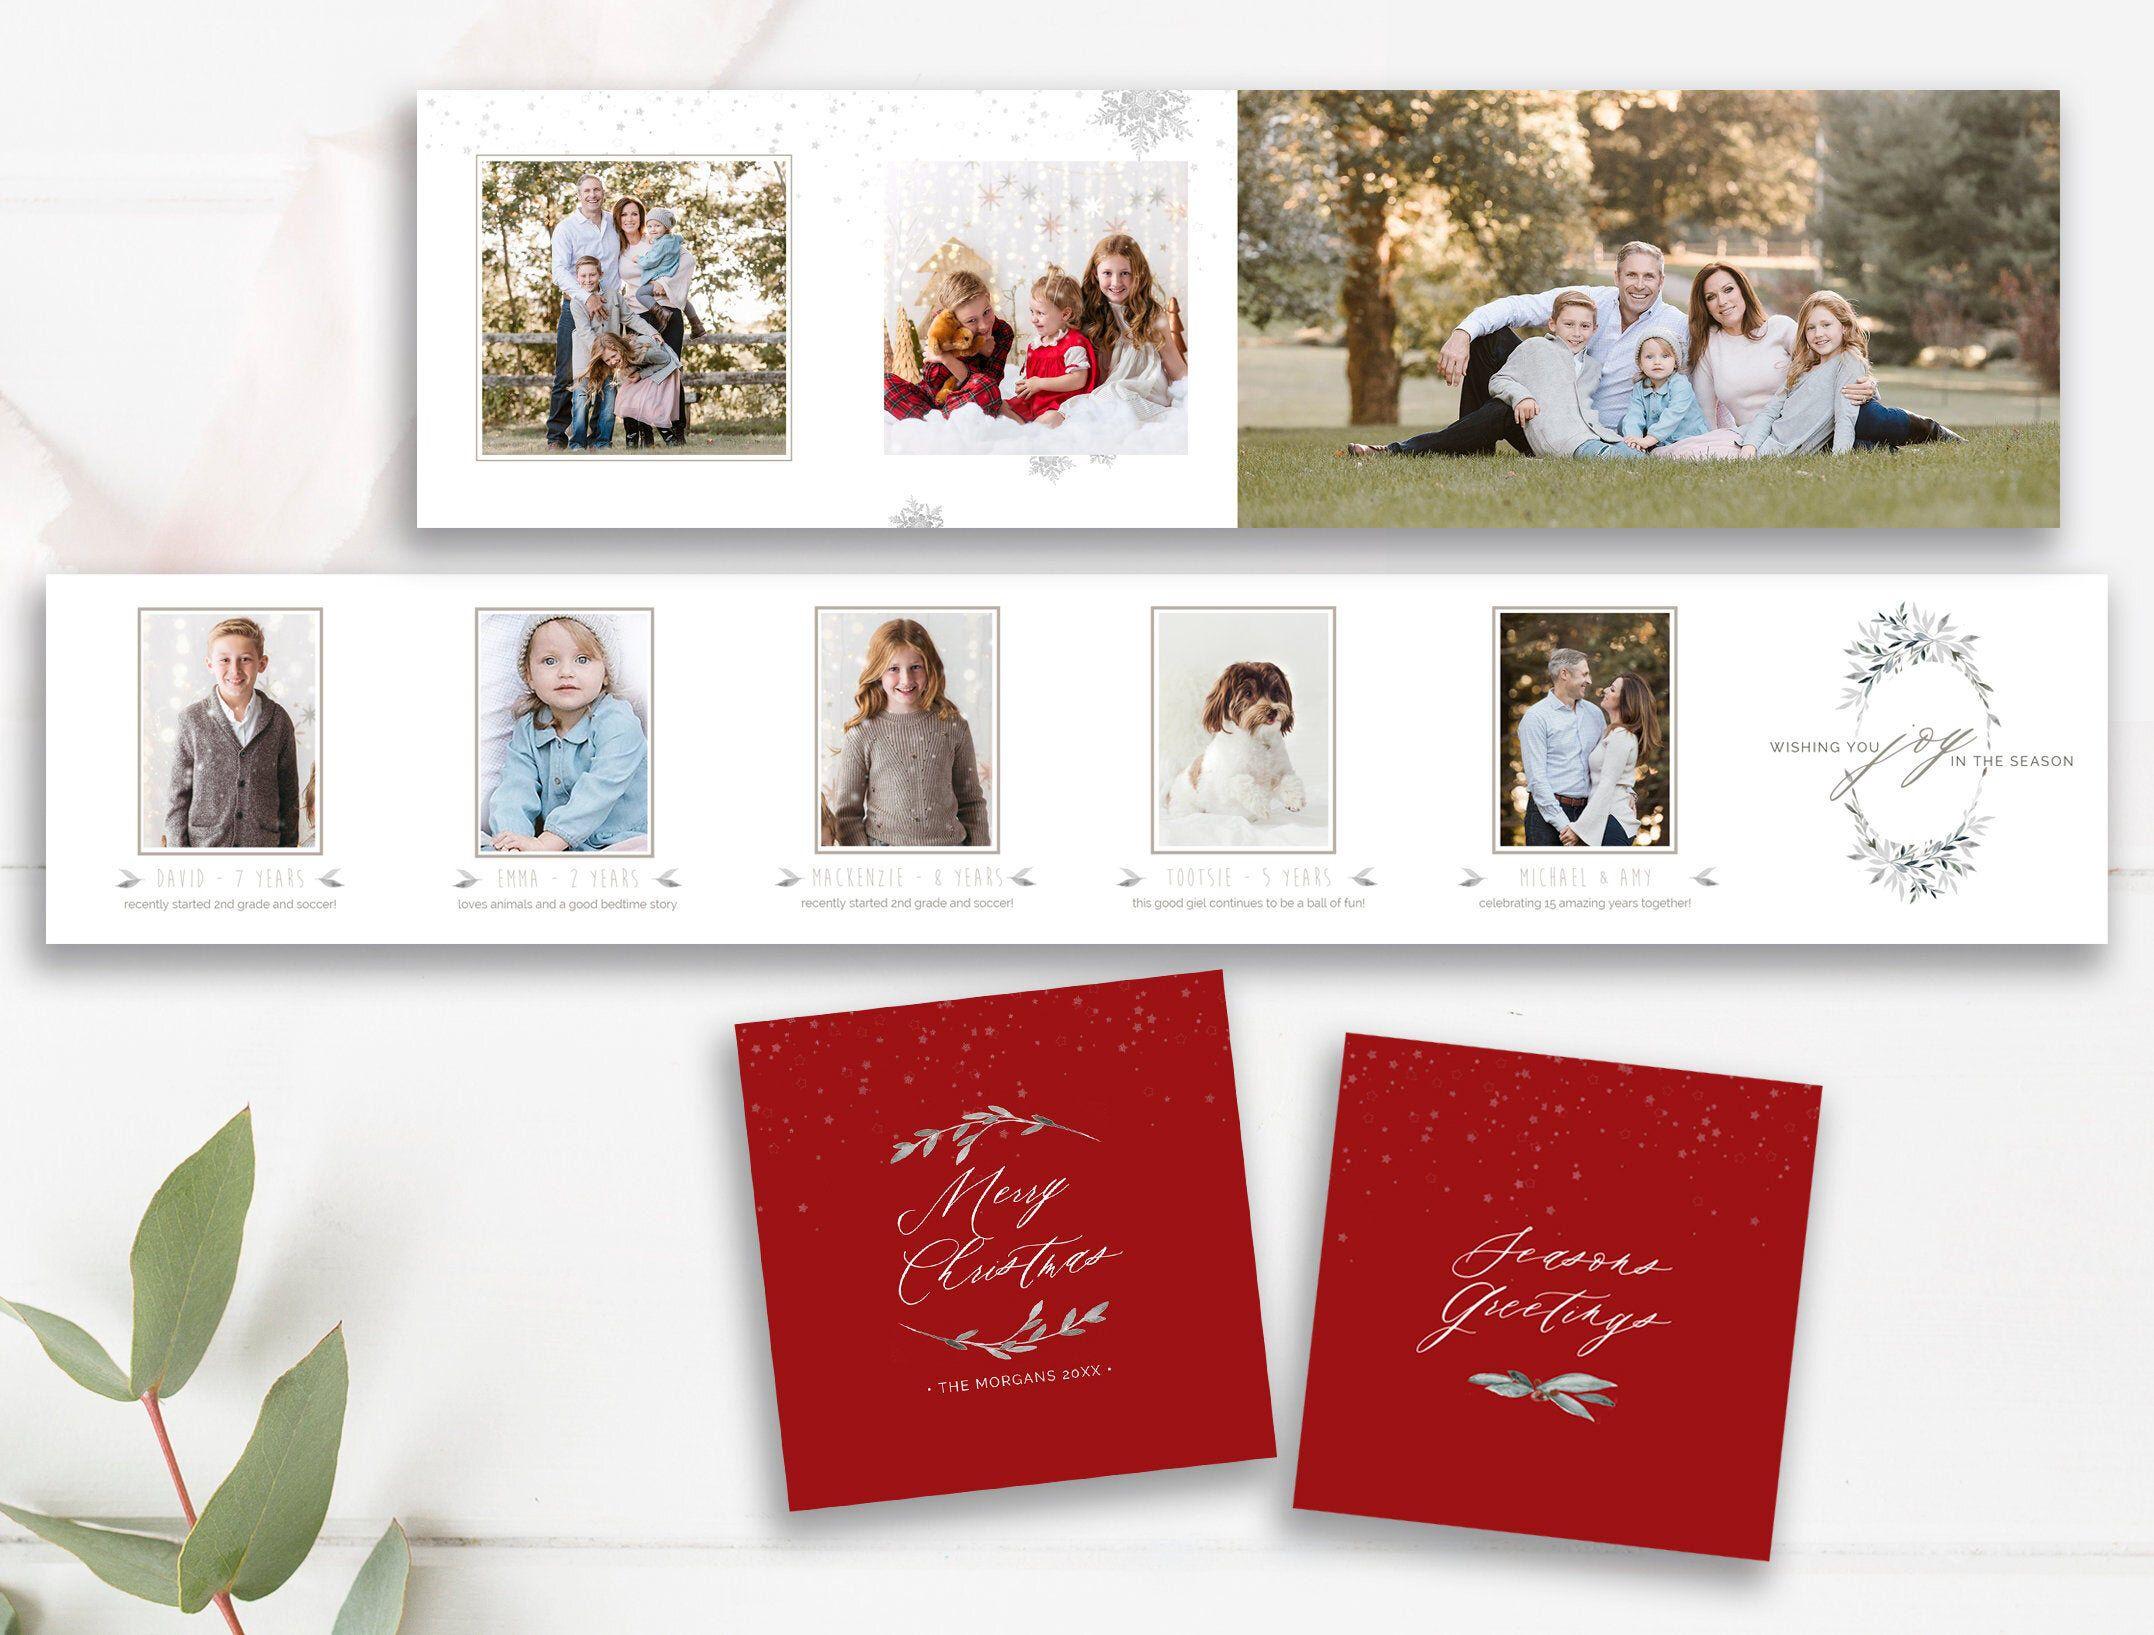 Christmas Accordion Mini Photo Book Photographer Templates By Stephanie Design Mini Photo Books Christmas Photo Album Accordion Templates